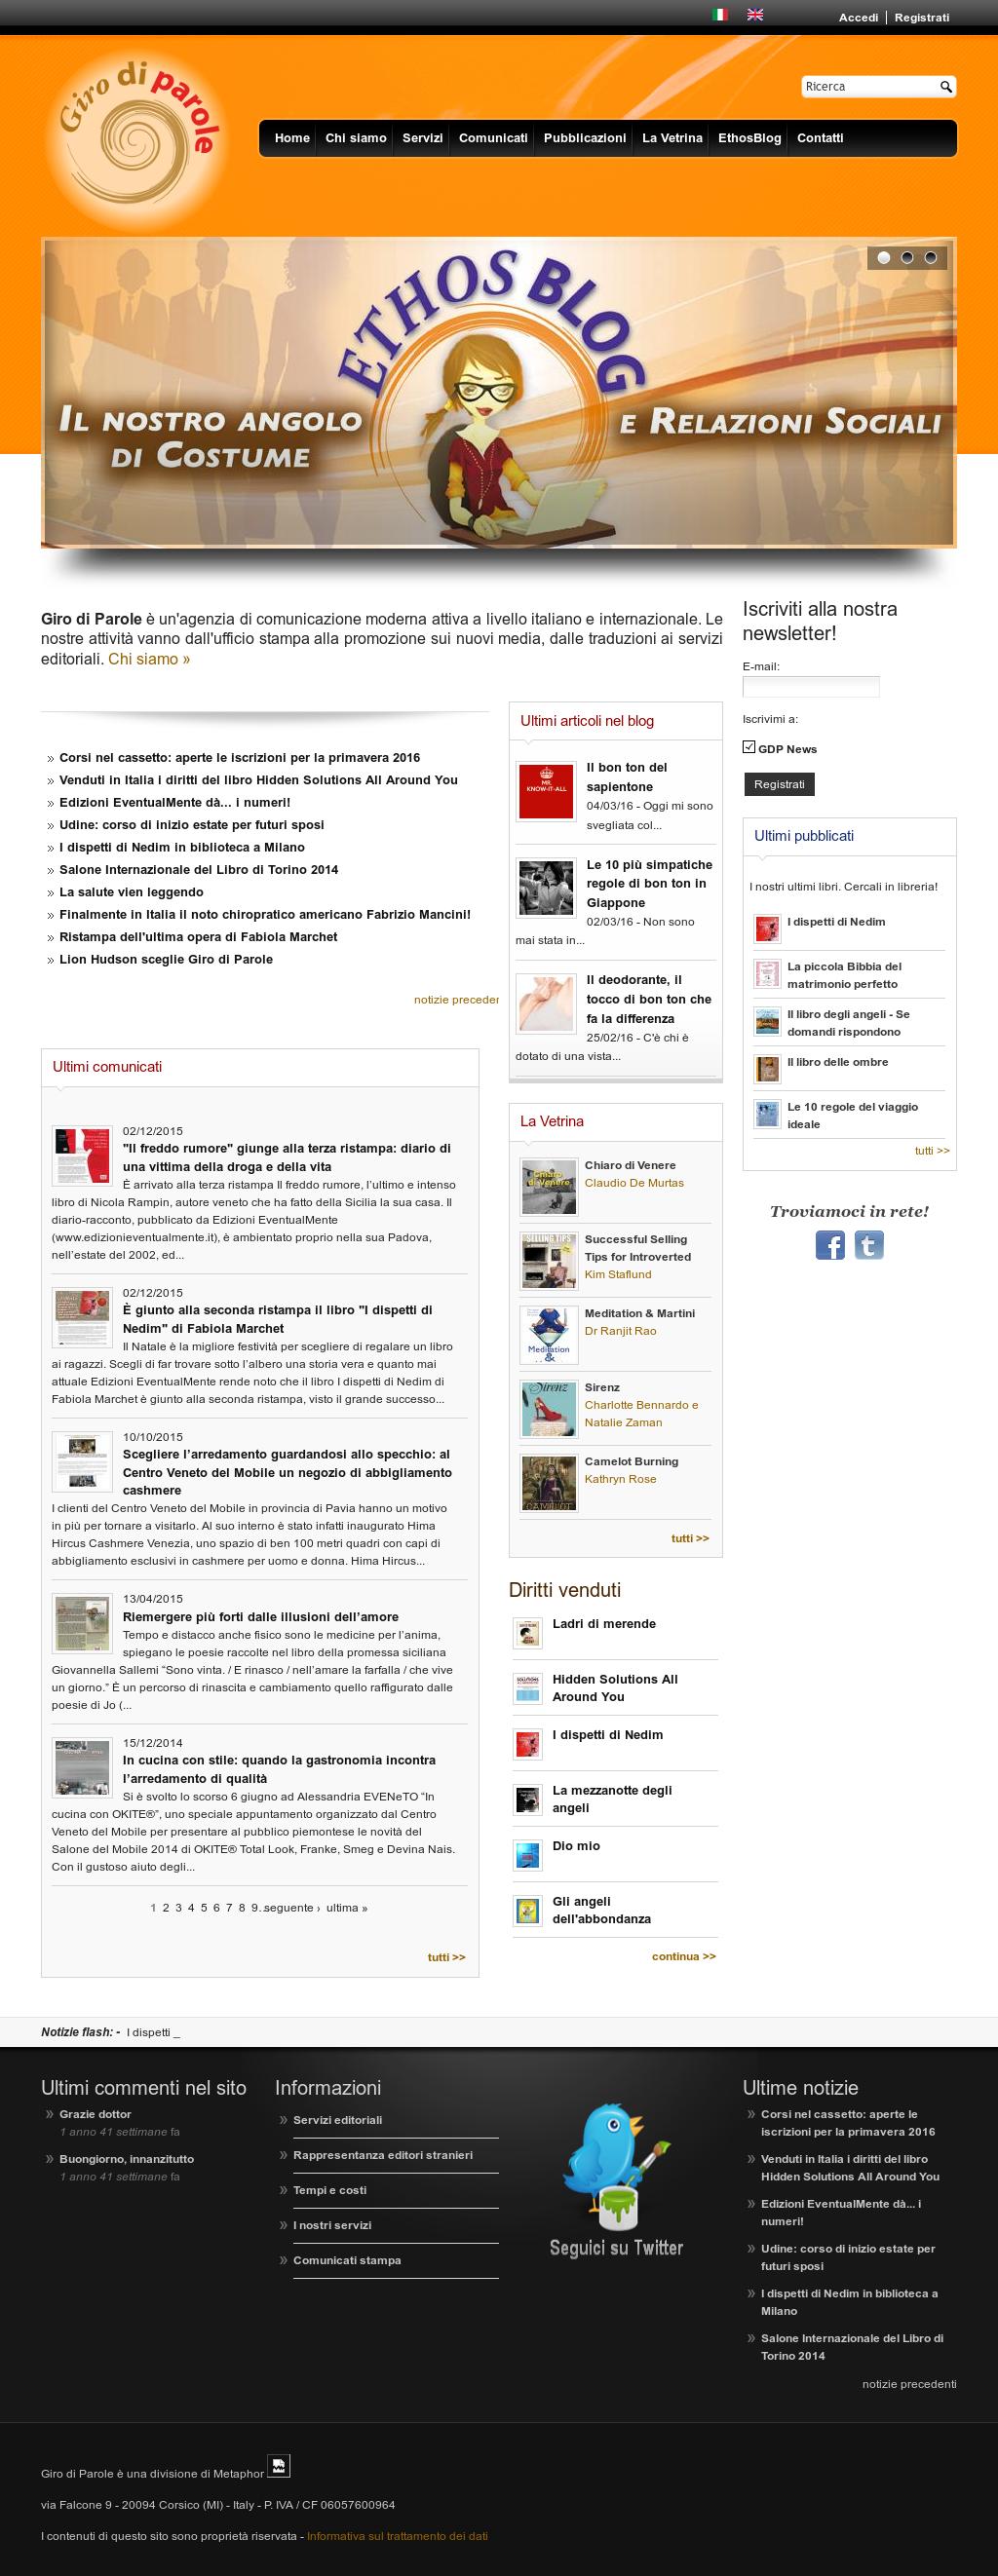 Lo Specchio In Cucina giro di parole metaphor competitors, revenue and employees